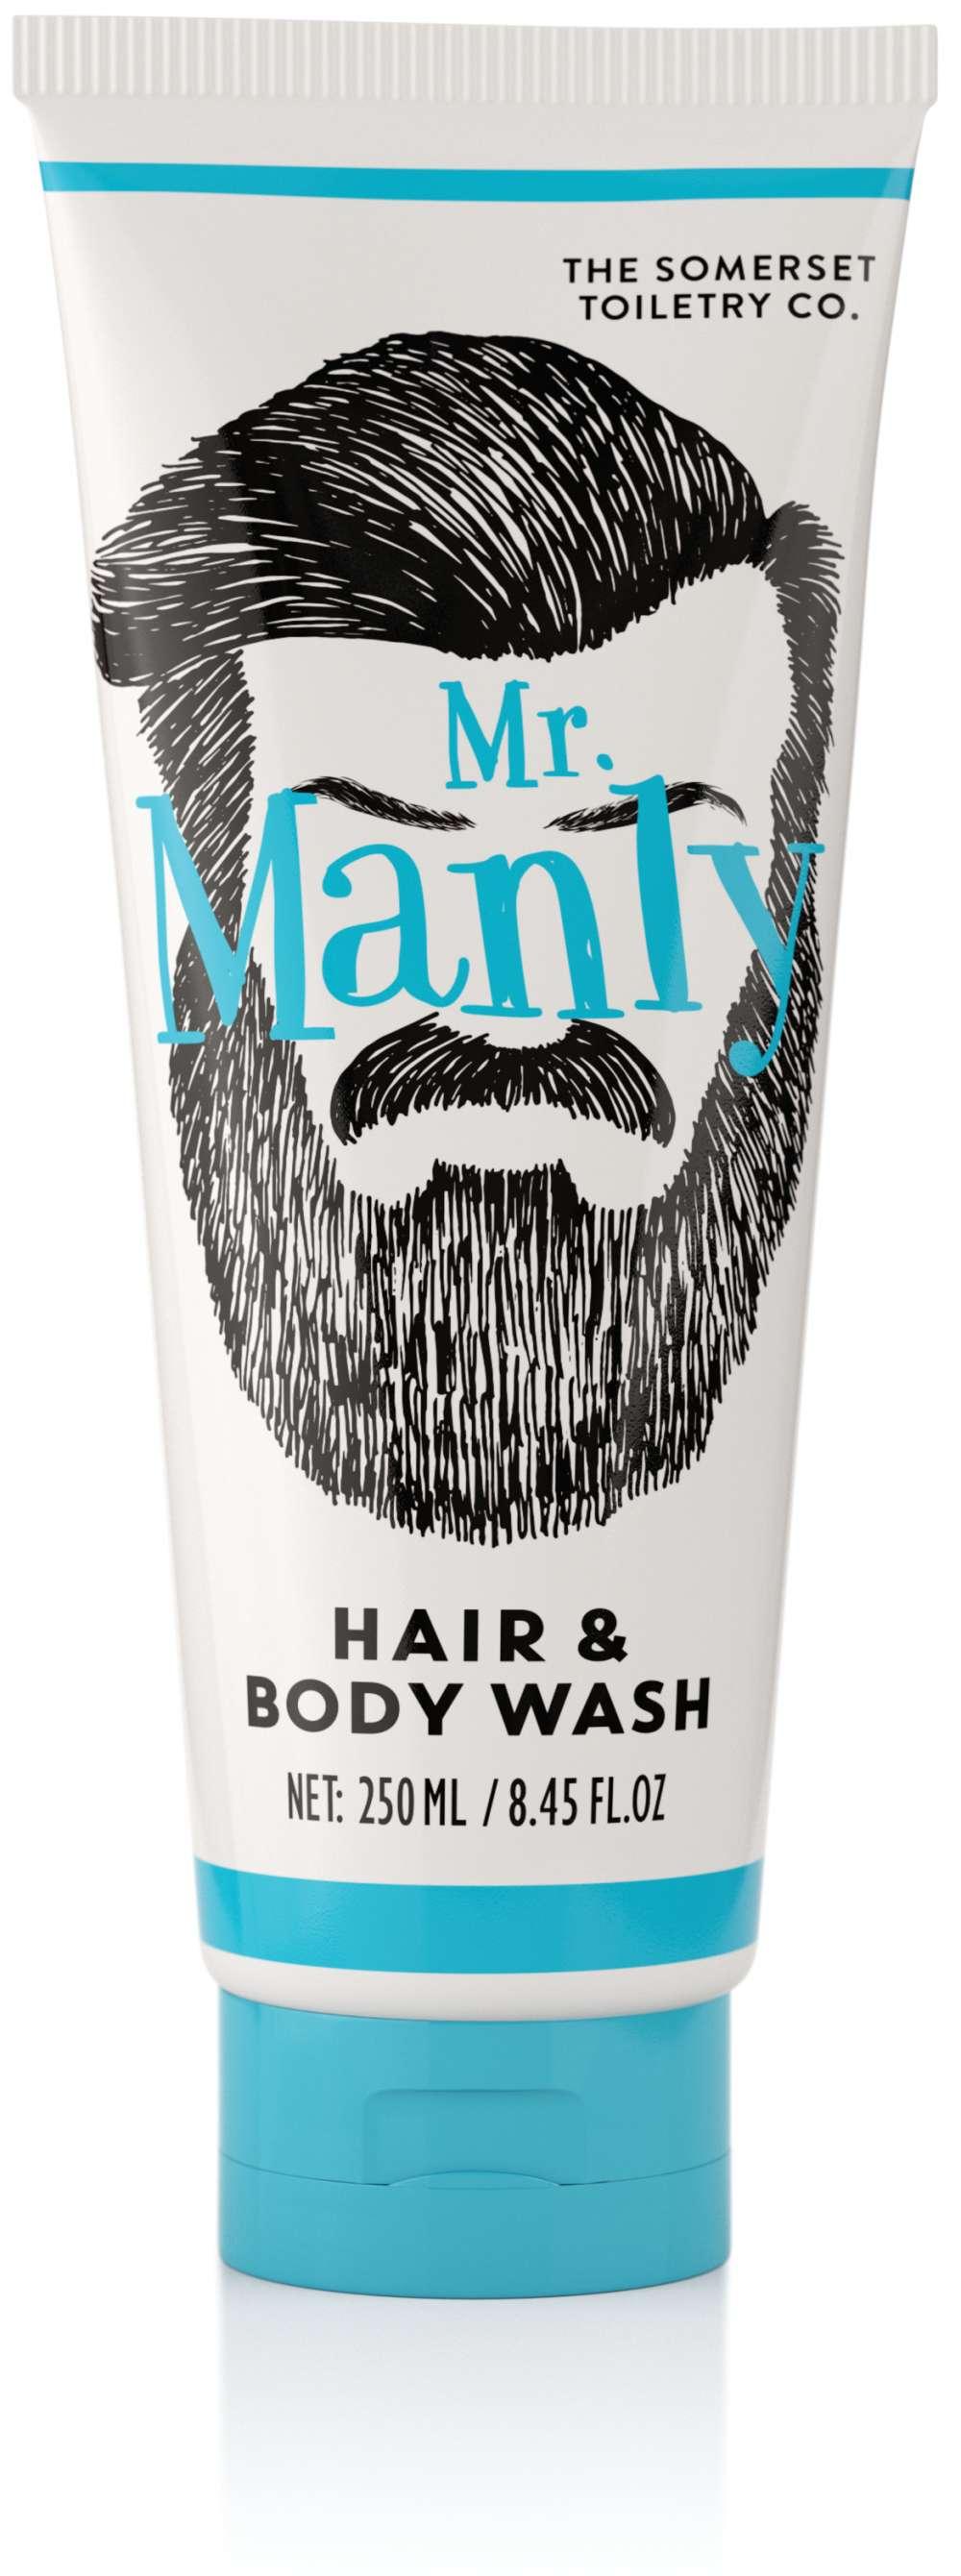 Mr Manly (Beard) Hair & Body Wash